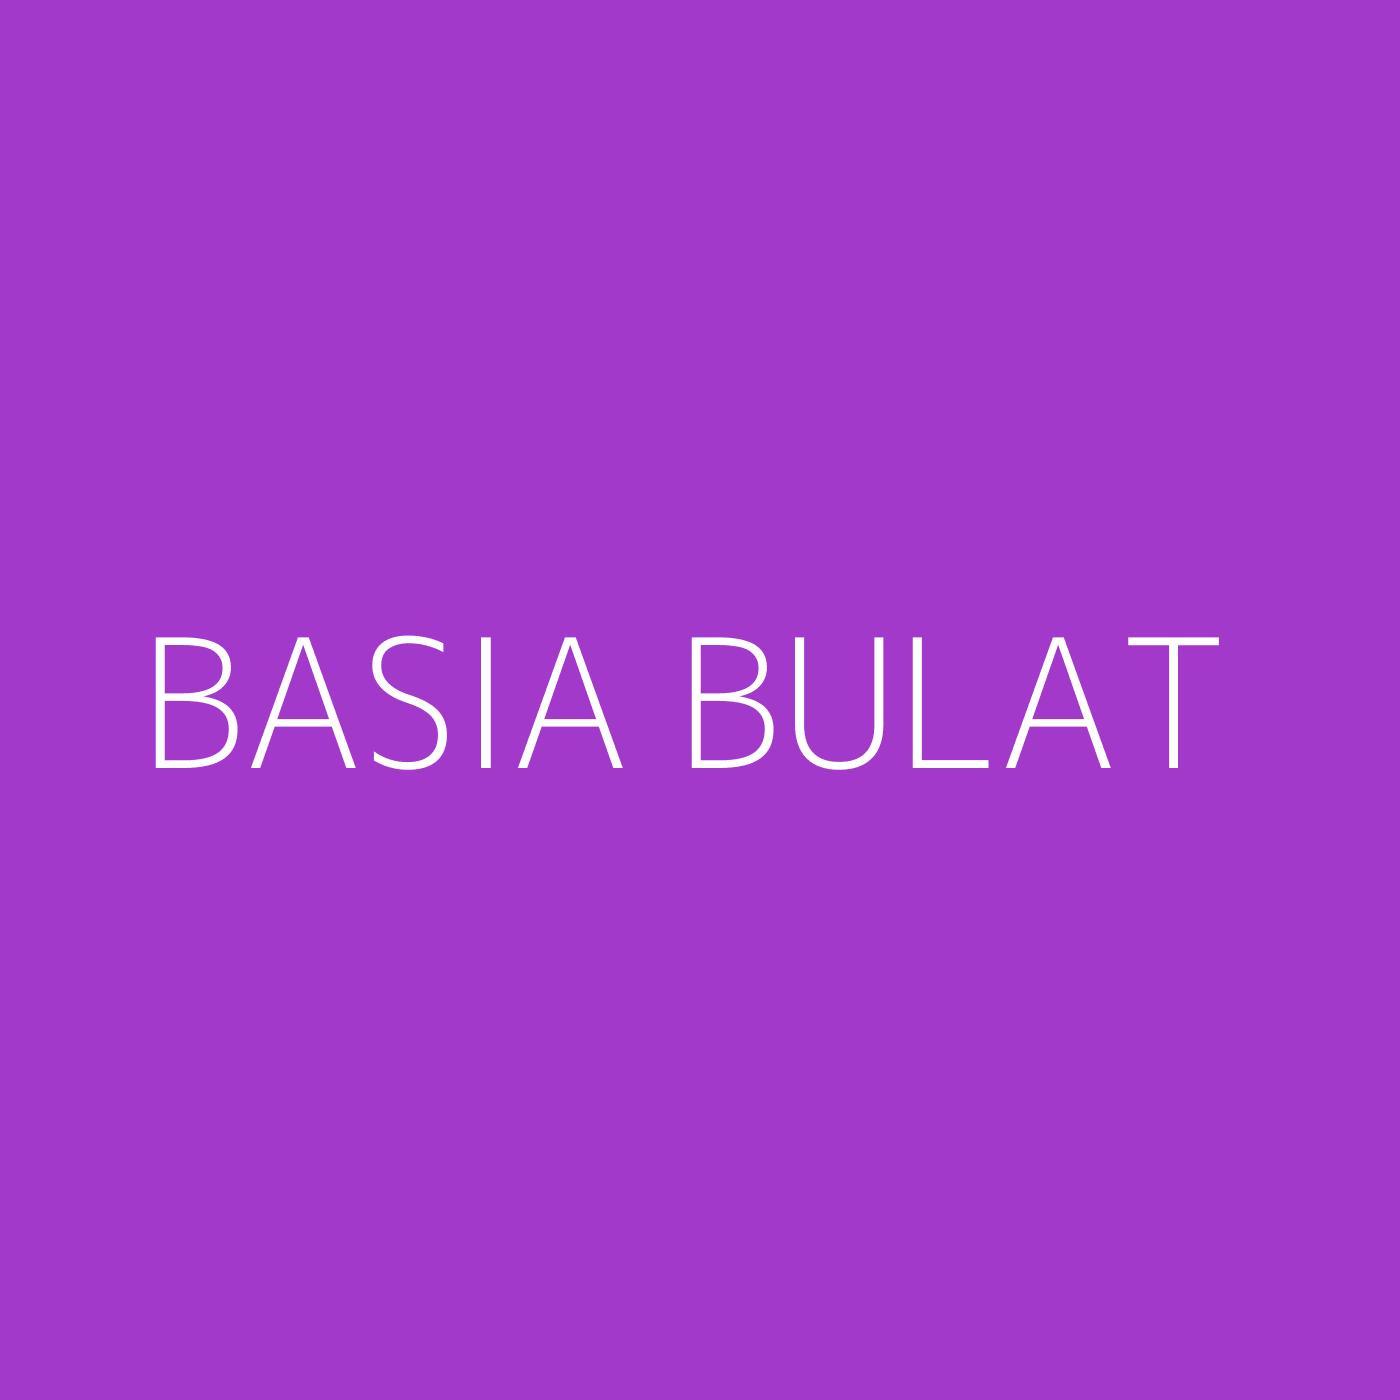 Basia Bulat Playlist Artwork